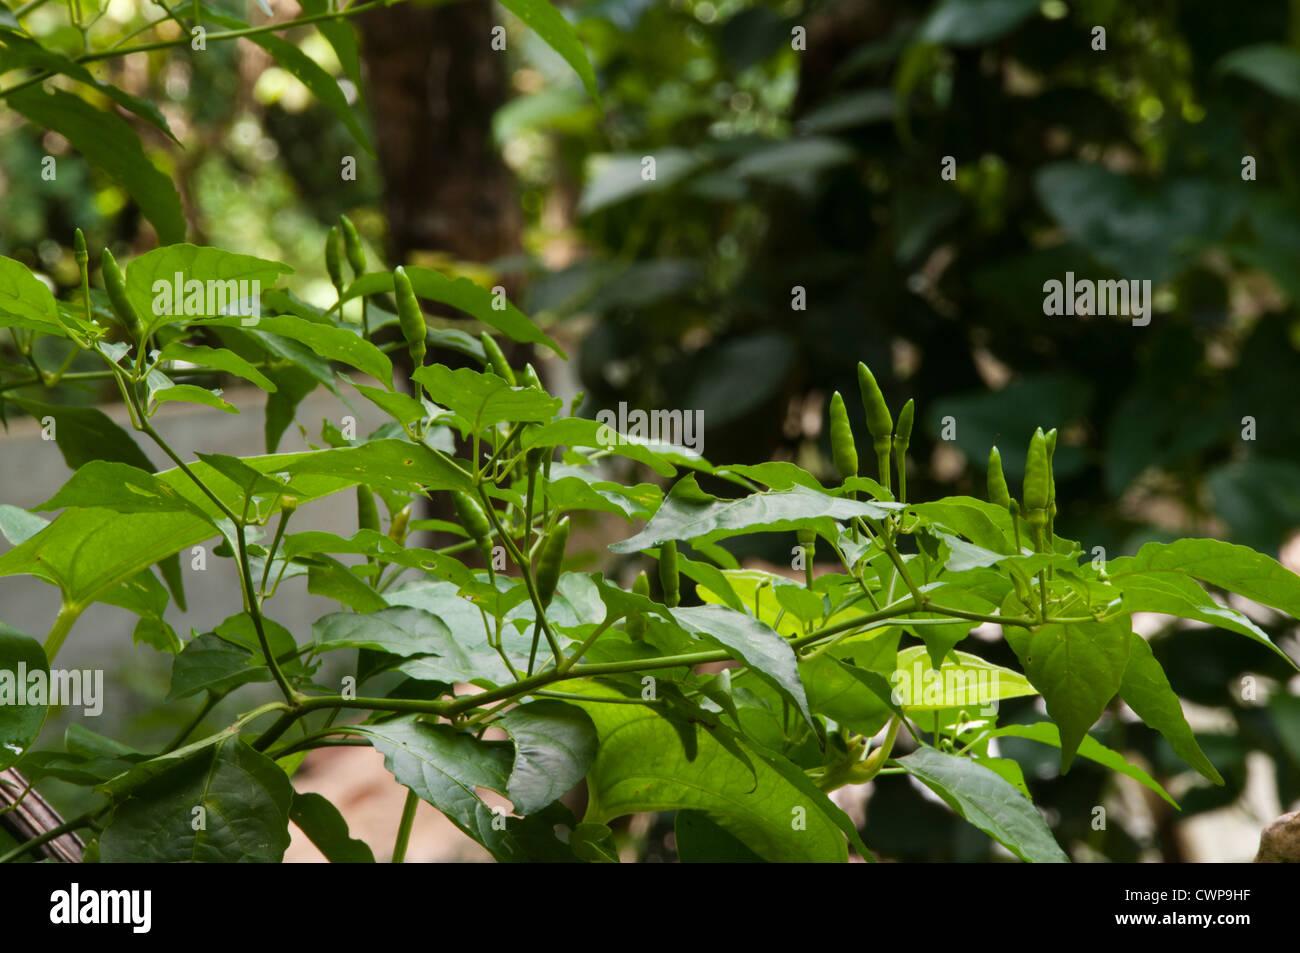 Bird's eye chili or Thai chili plant - Stock Image